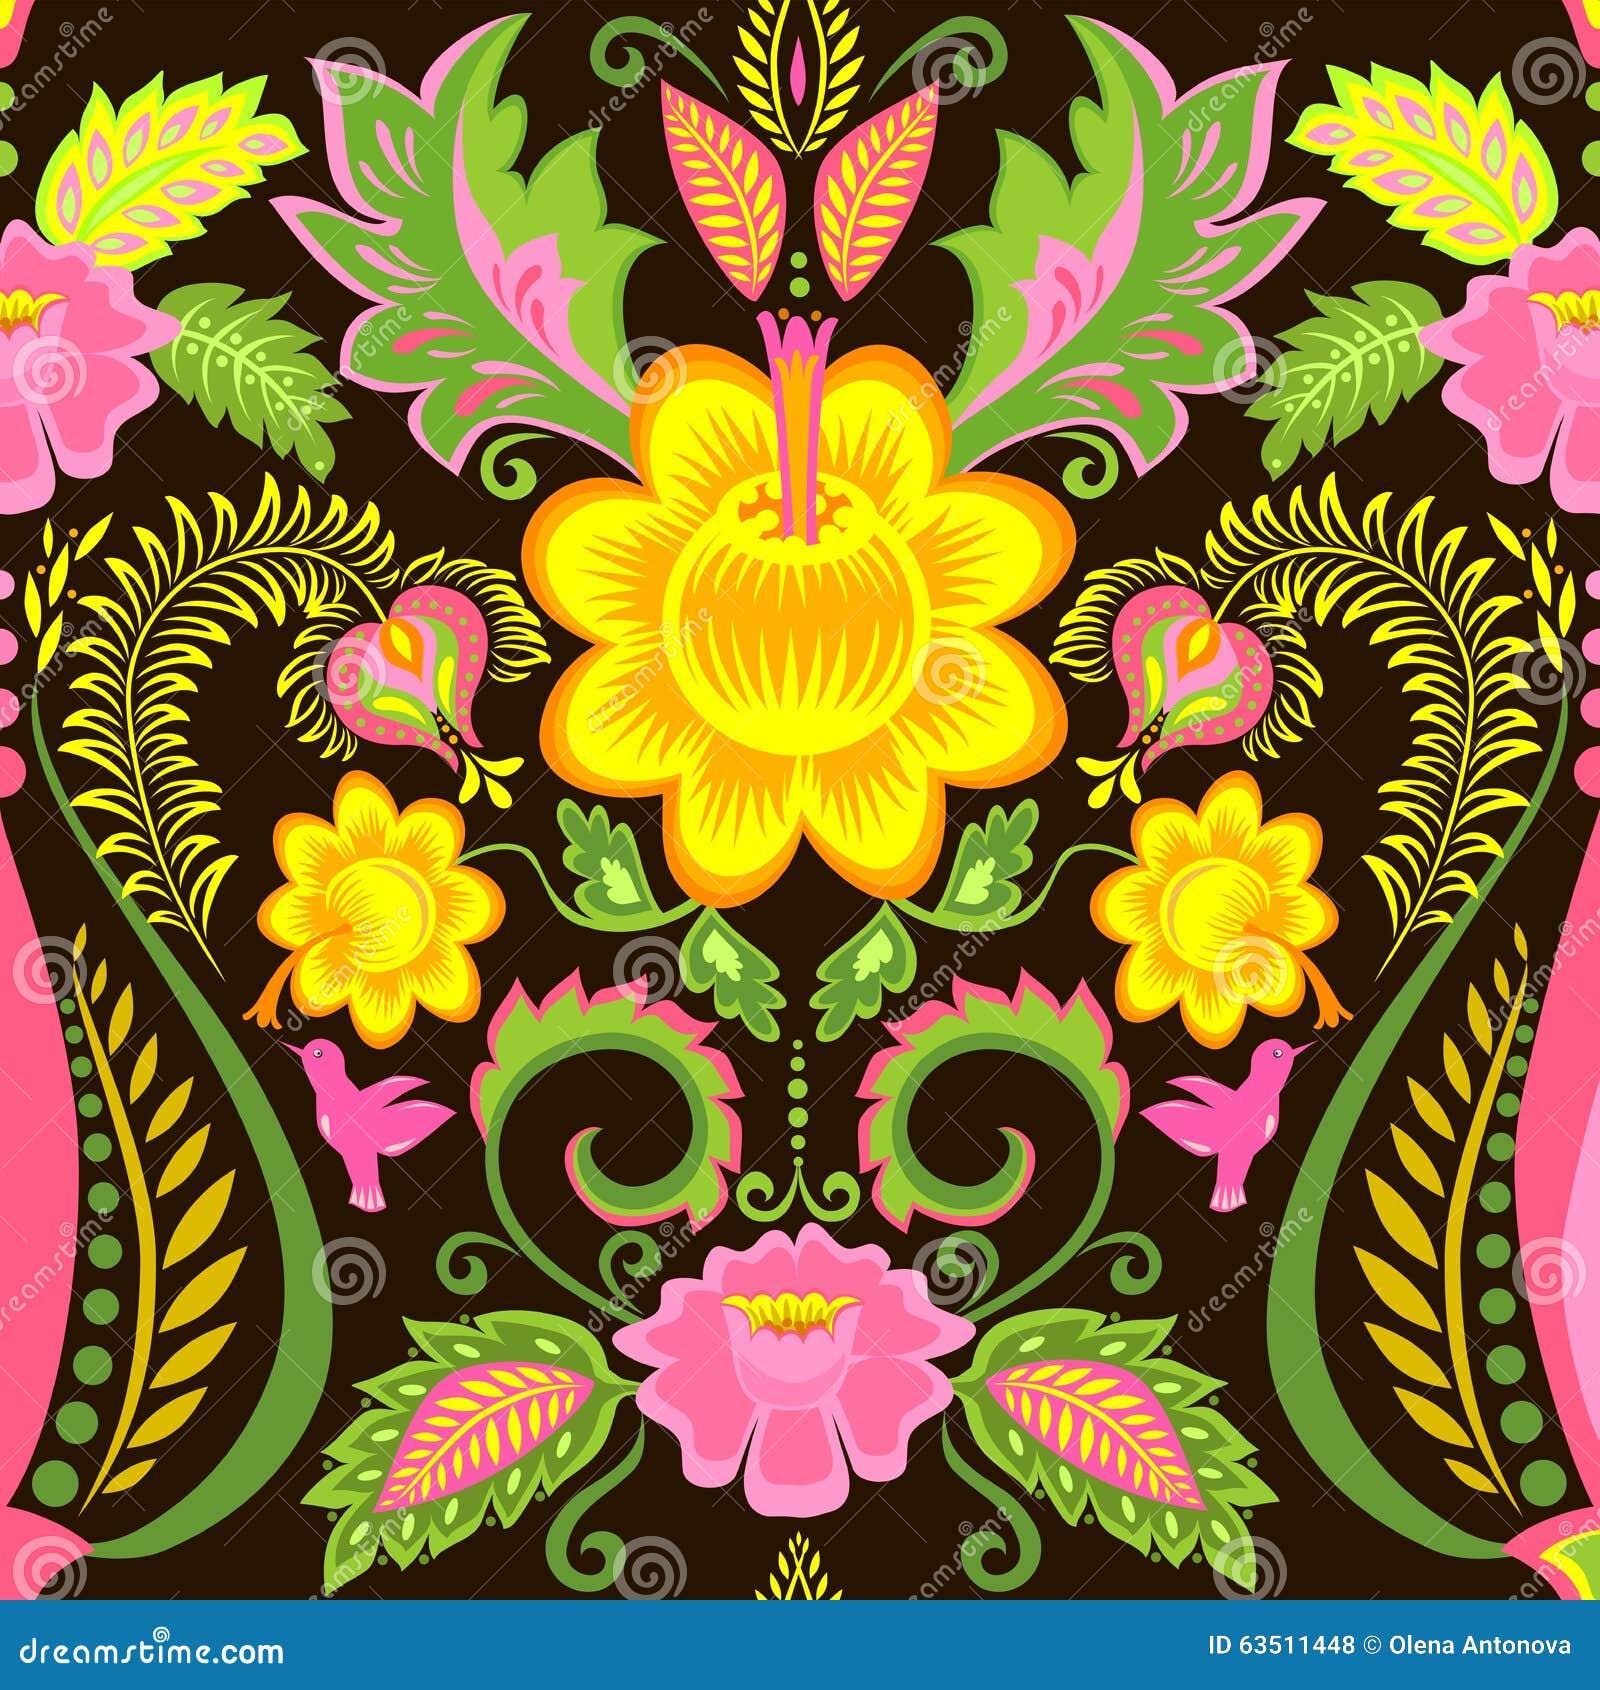 Papier peint vintage fleuri papier peint vintage fleuri fond noir autres vues autres vues - Papier peint fleuri vintage ...